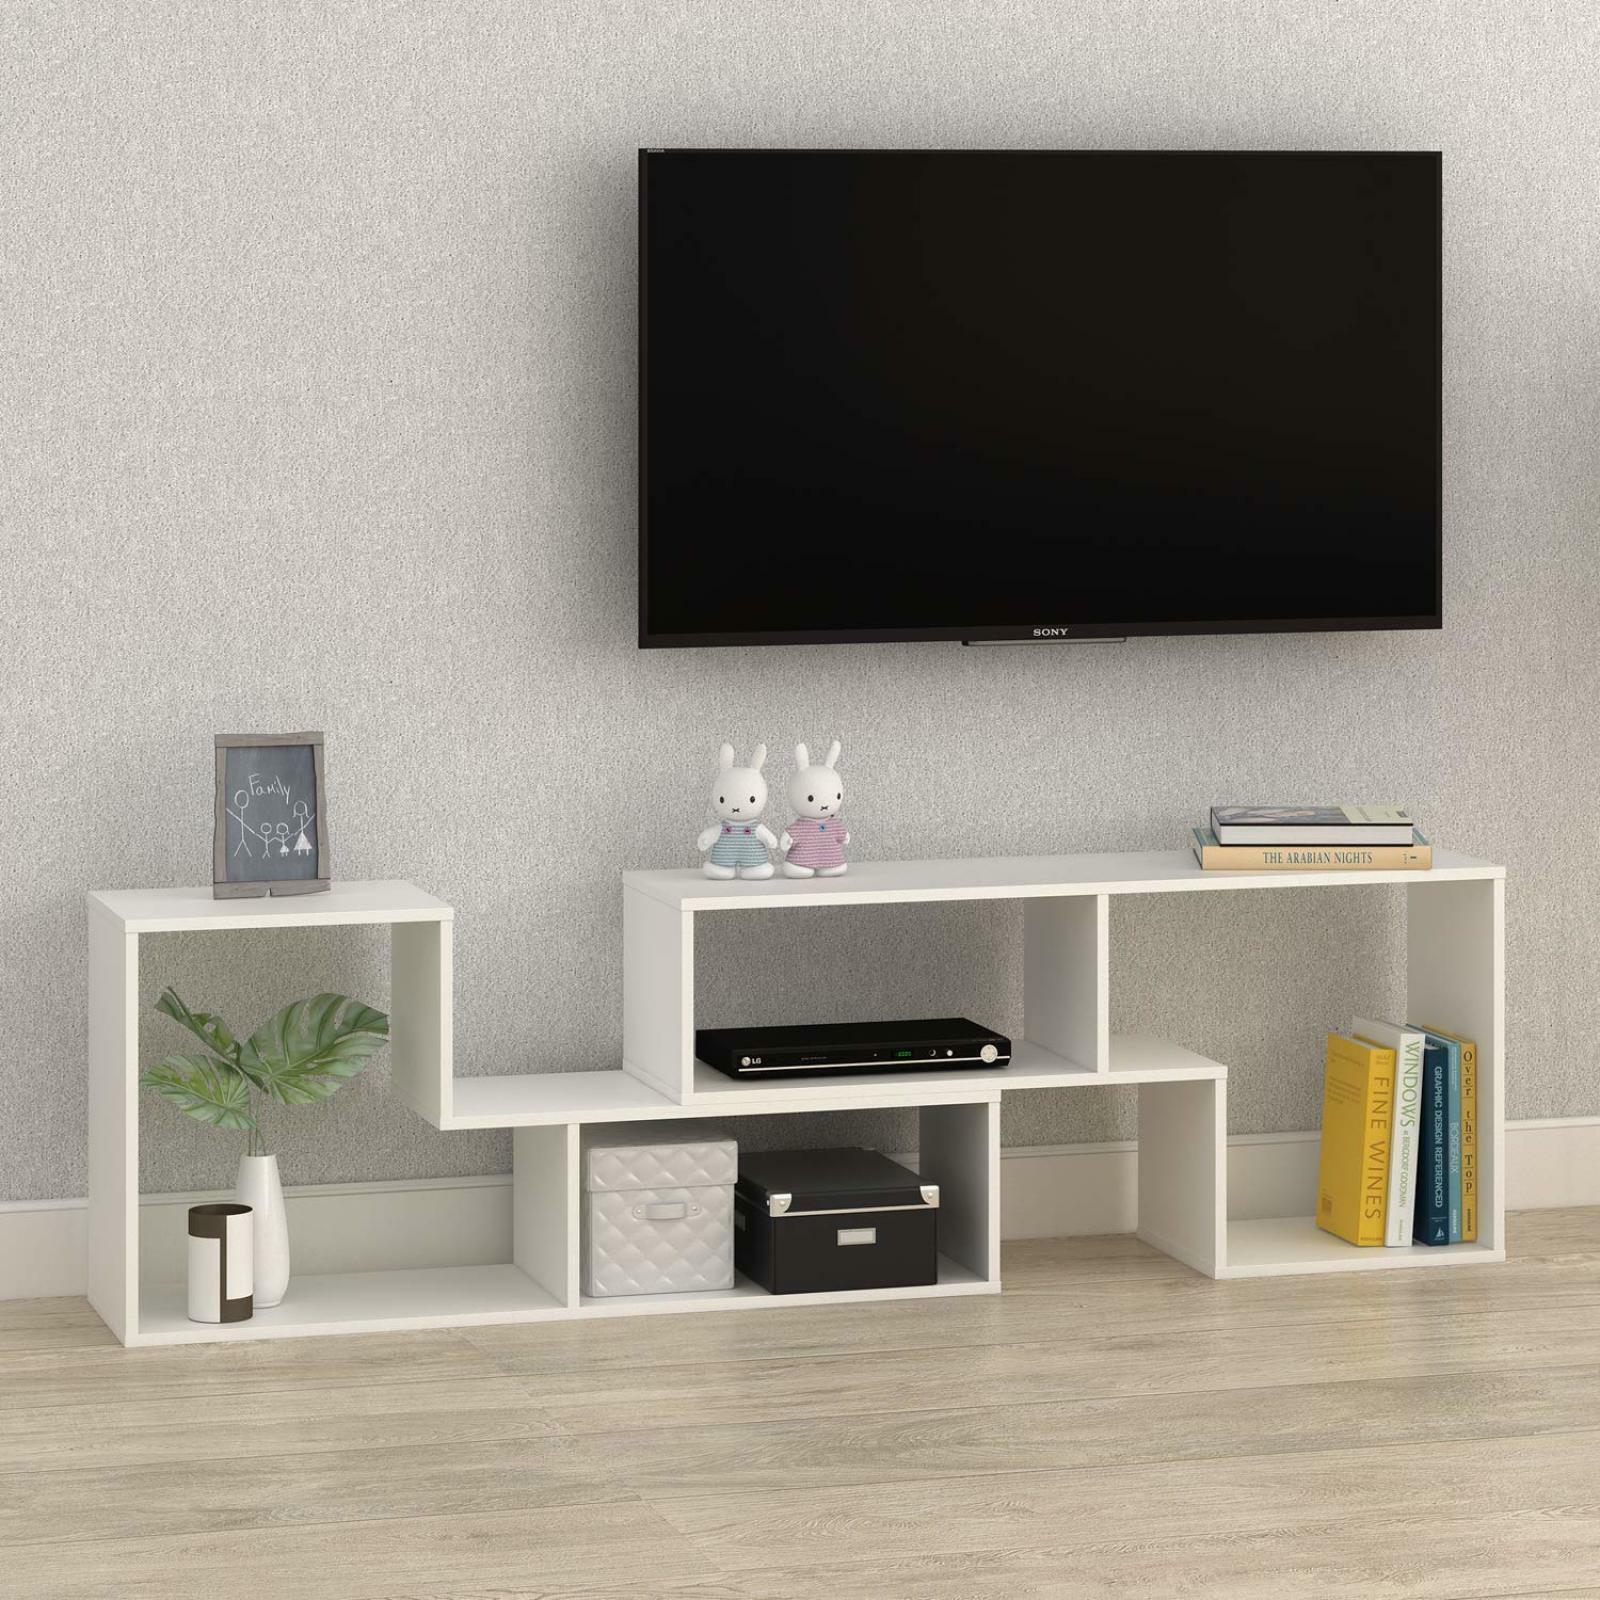 Modern  TV Stand Entertainment Center Media Stand Unit  Bookcase Weiß